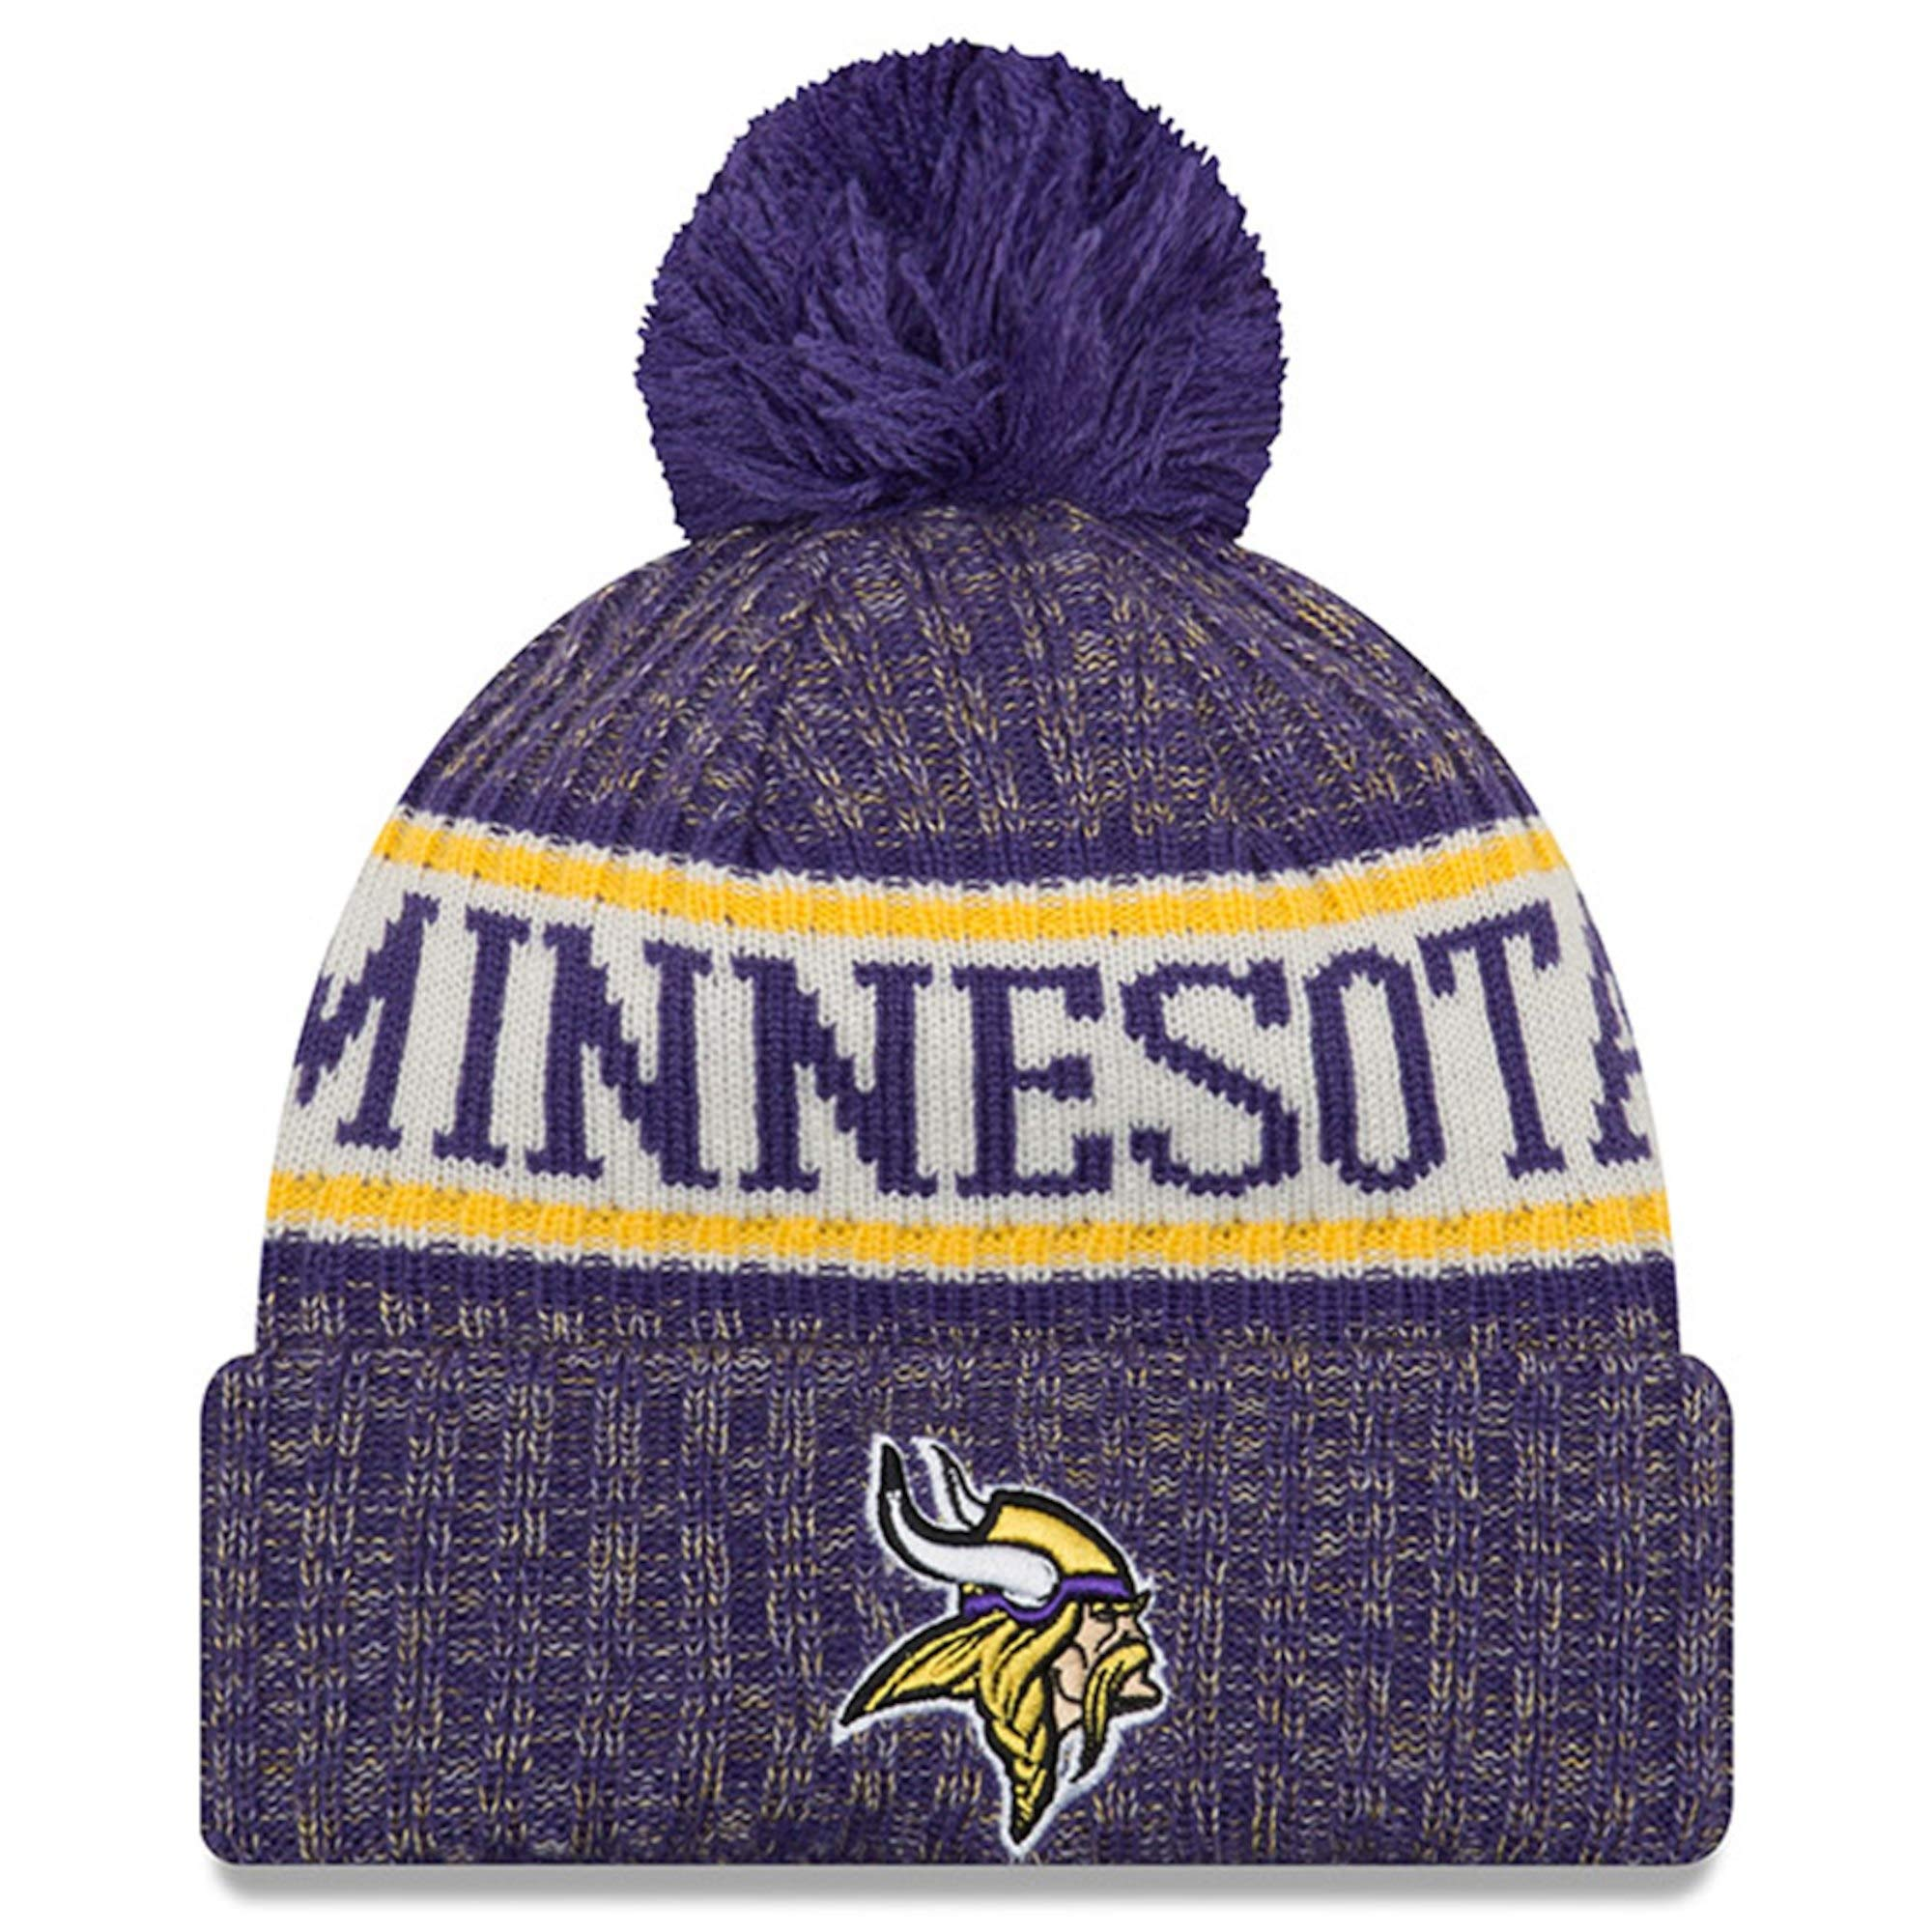 New Era Knit Minnesota Vikings Purple On Field Sideline Sport Knit Winter Stocking Beanie Pom Hat Cap 2015 by New Era